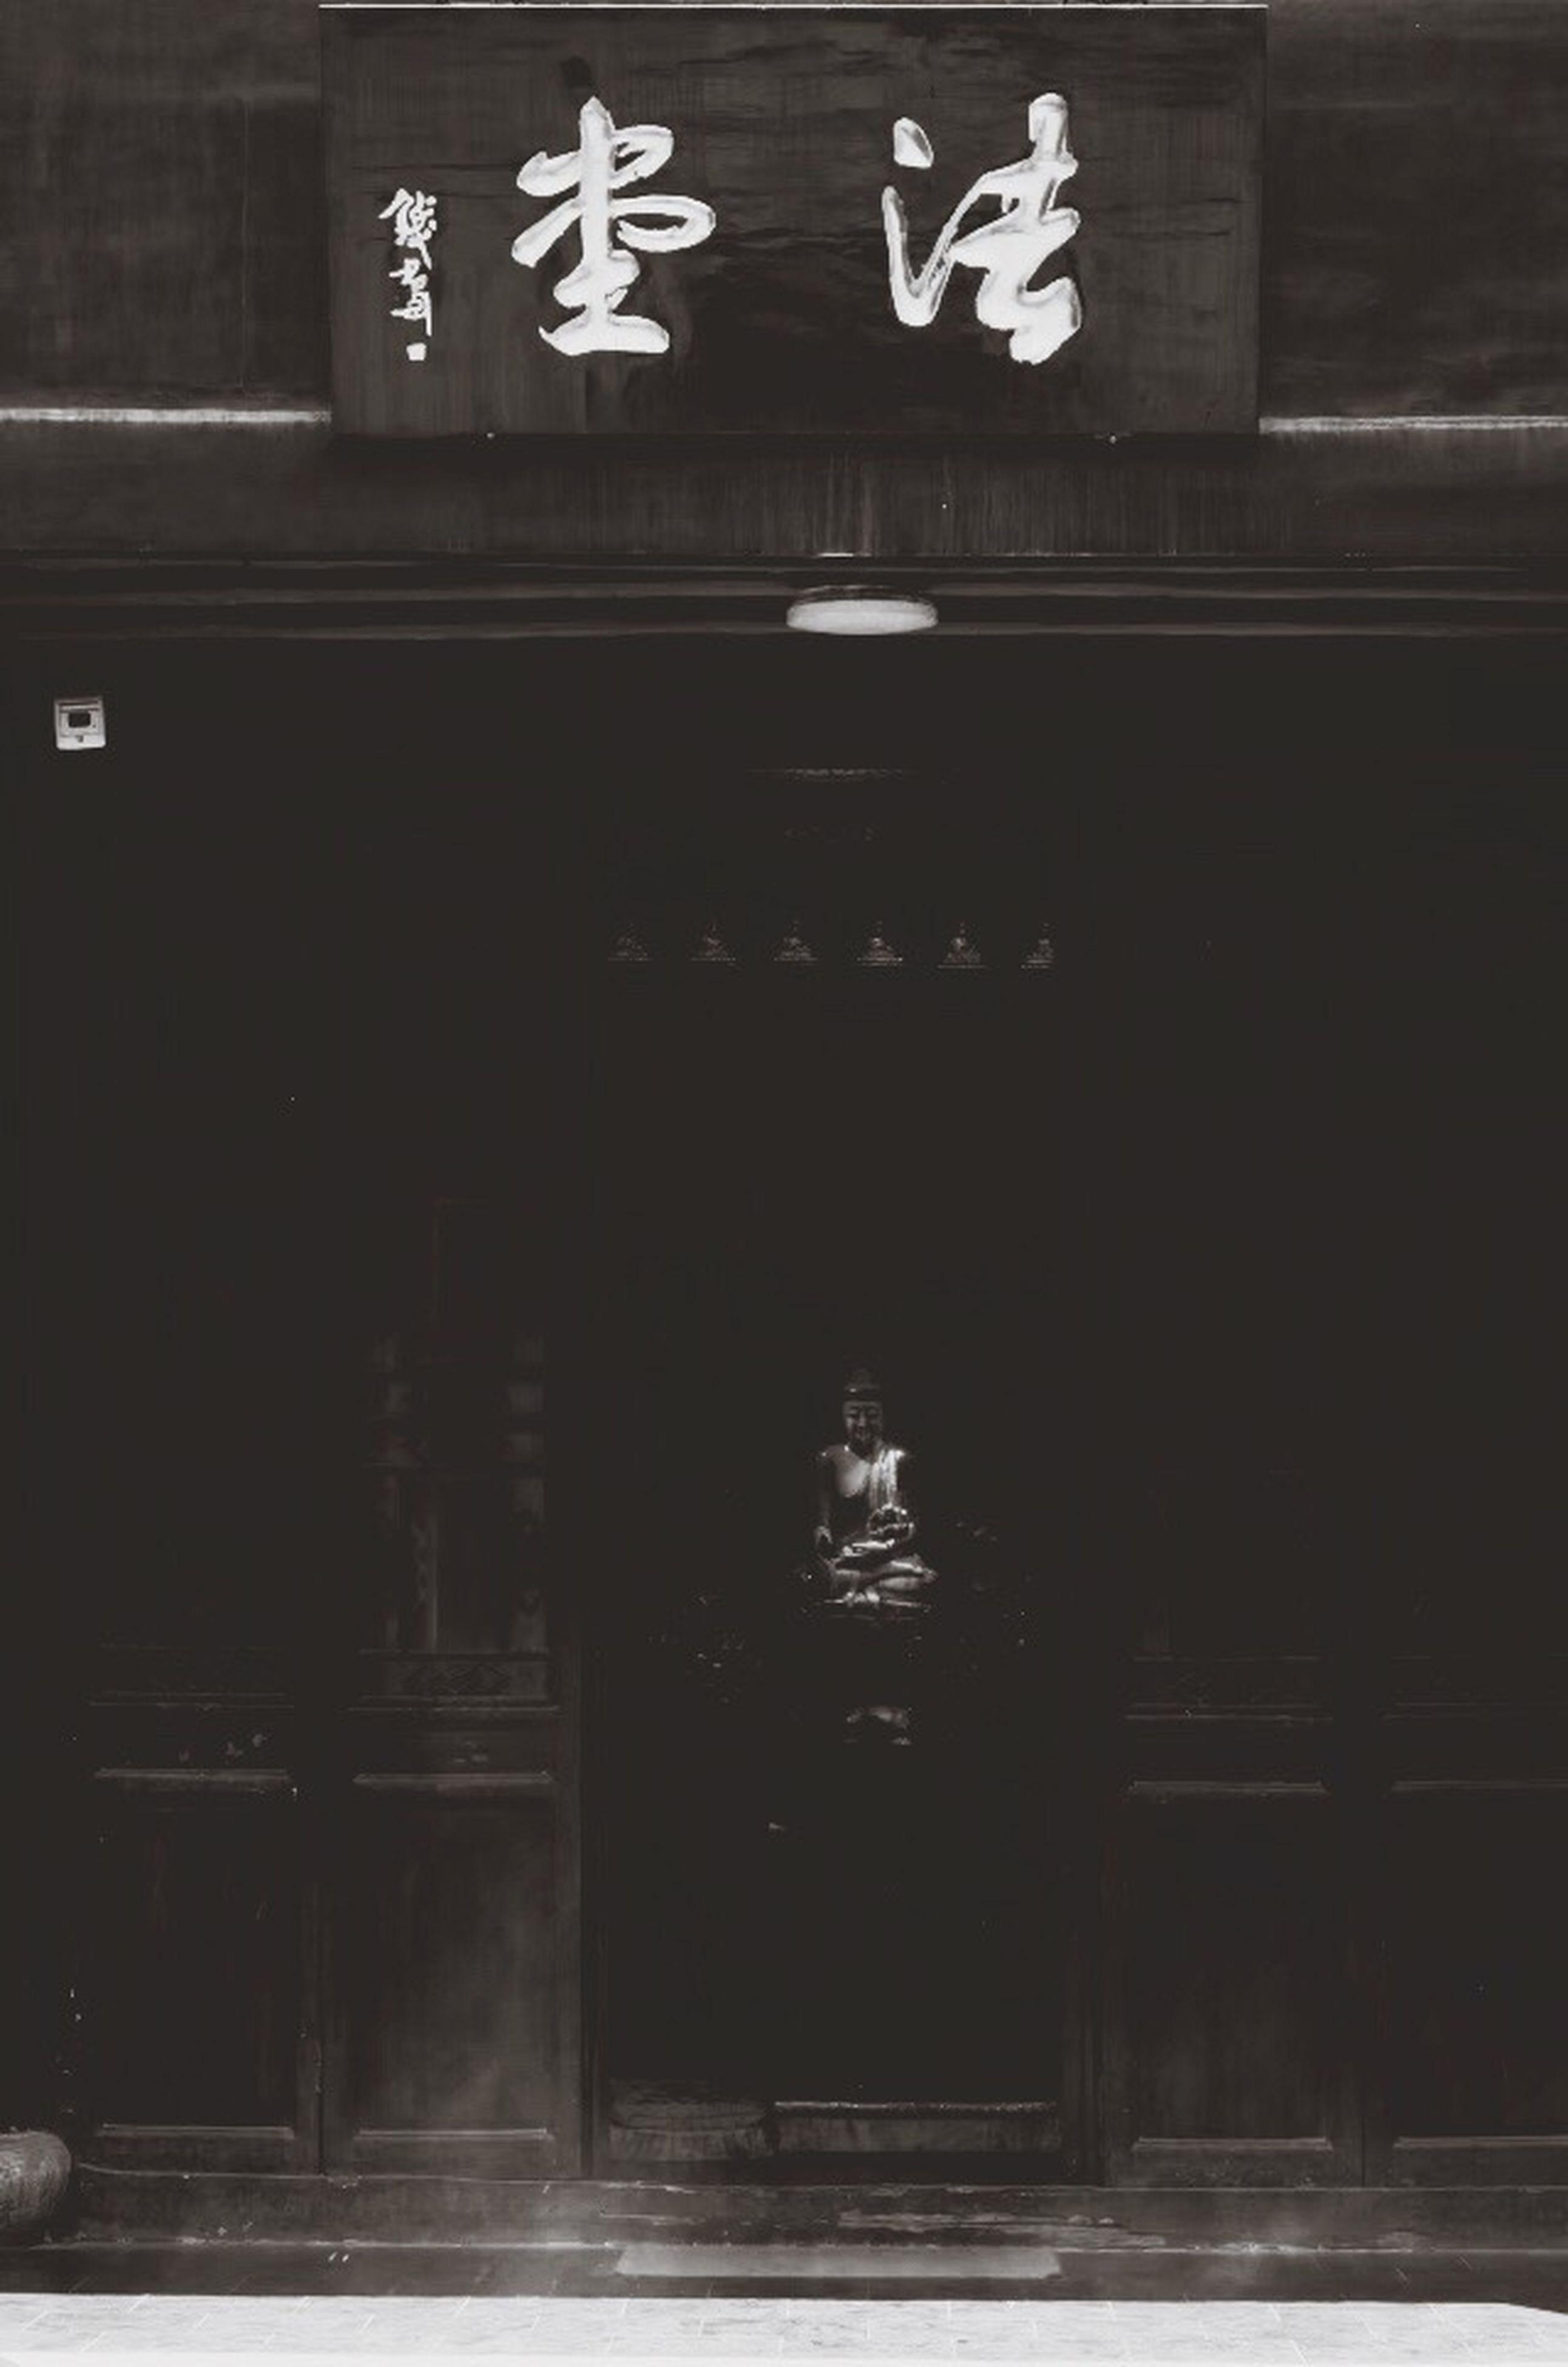 indoors, illuminated, no people, night, architecture